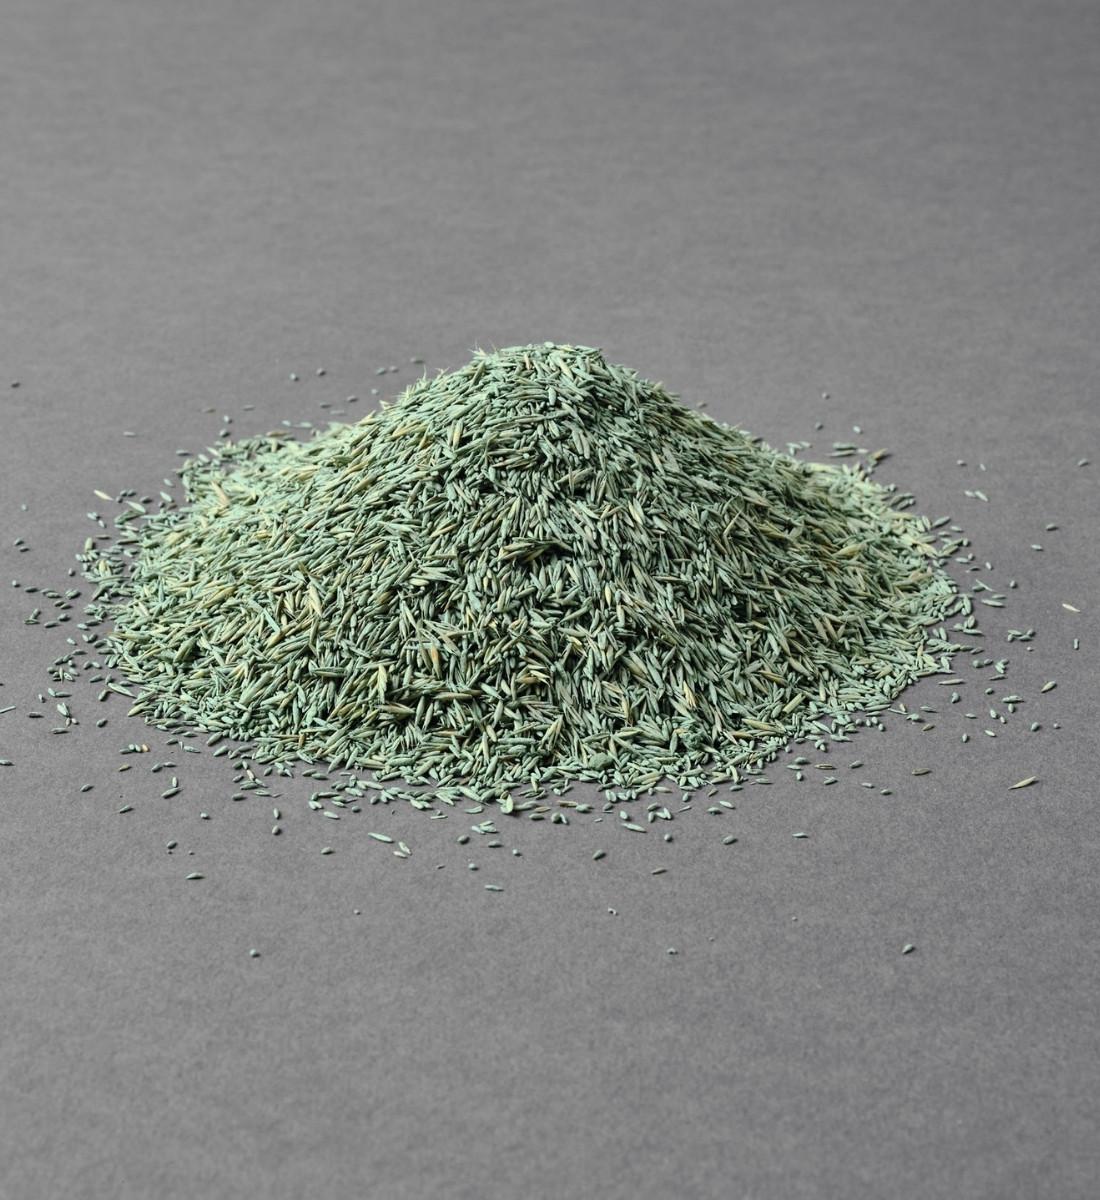 Gräsfrö Bar Power RPR rajgräs 1kg hög med gräsfrö